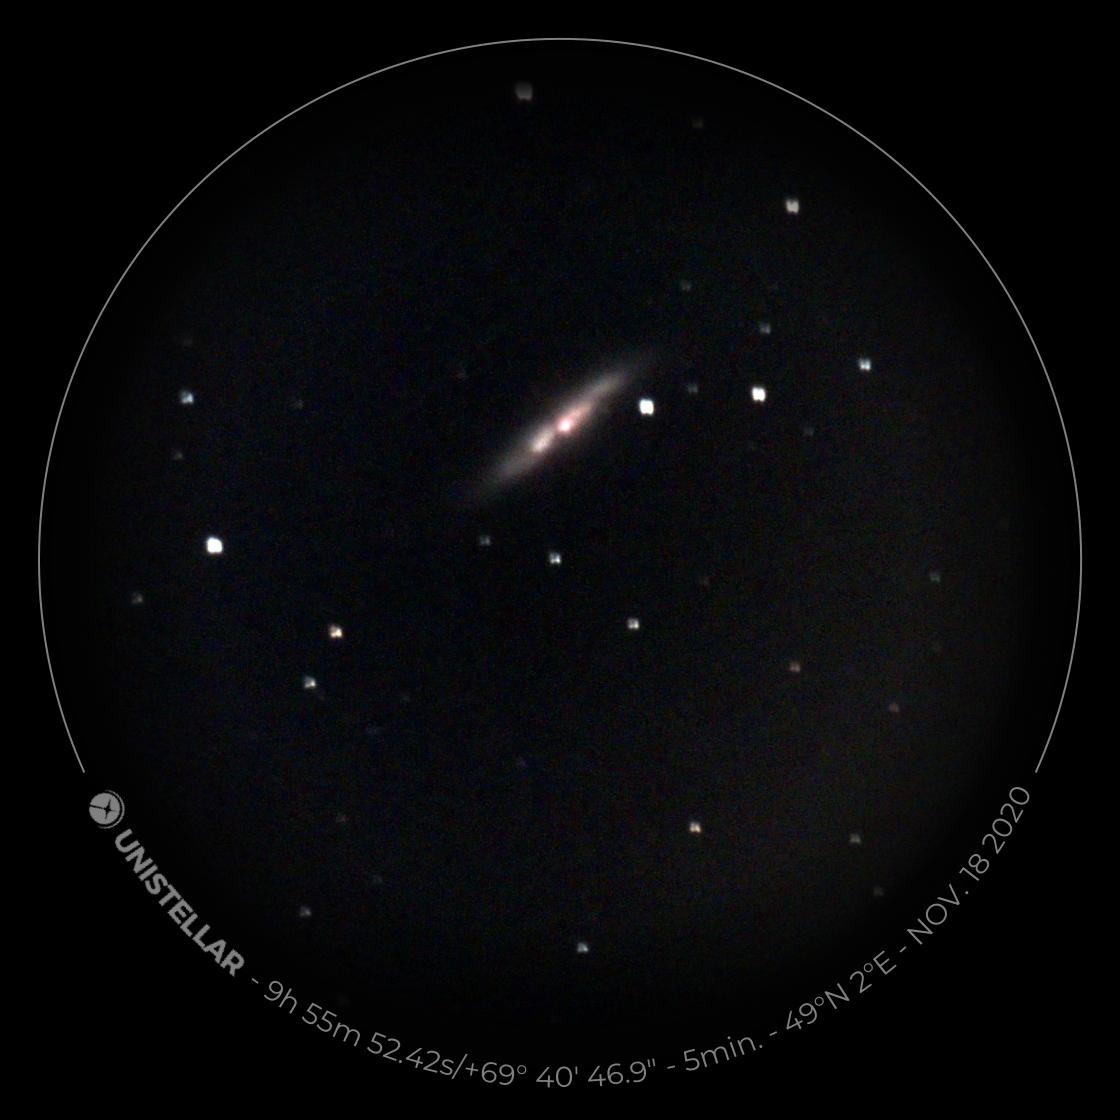 eVscope-20201117-234151.PNG.66aa4c4558376963863fc4c918395642.PNG